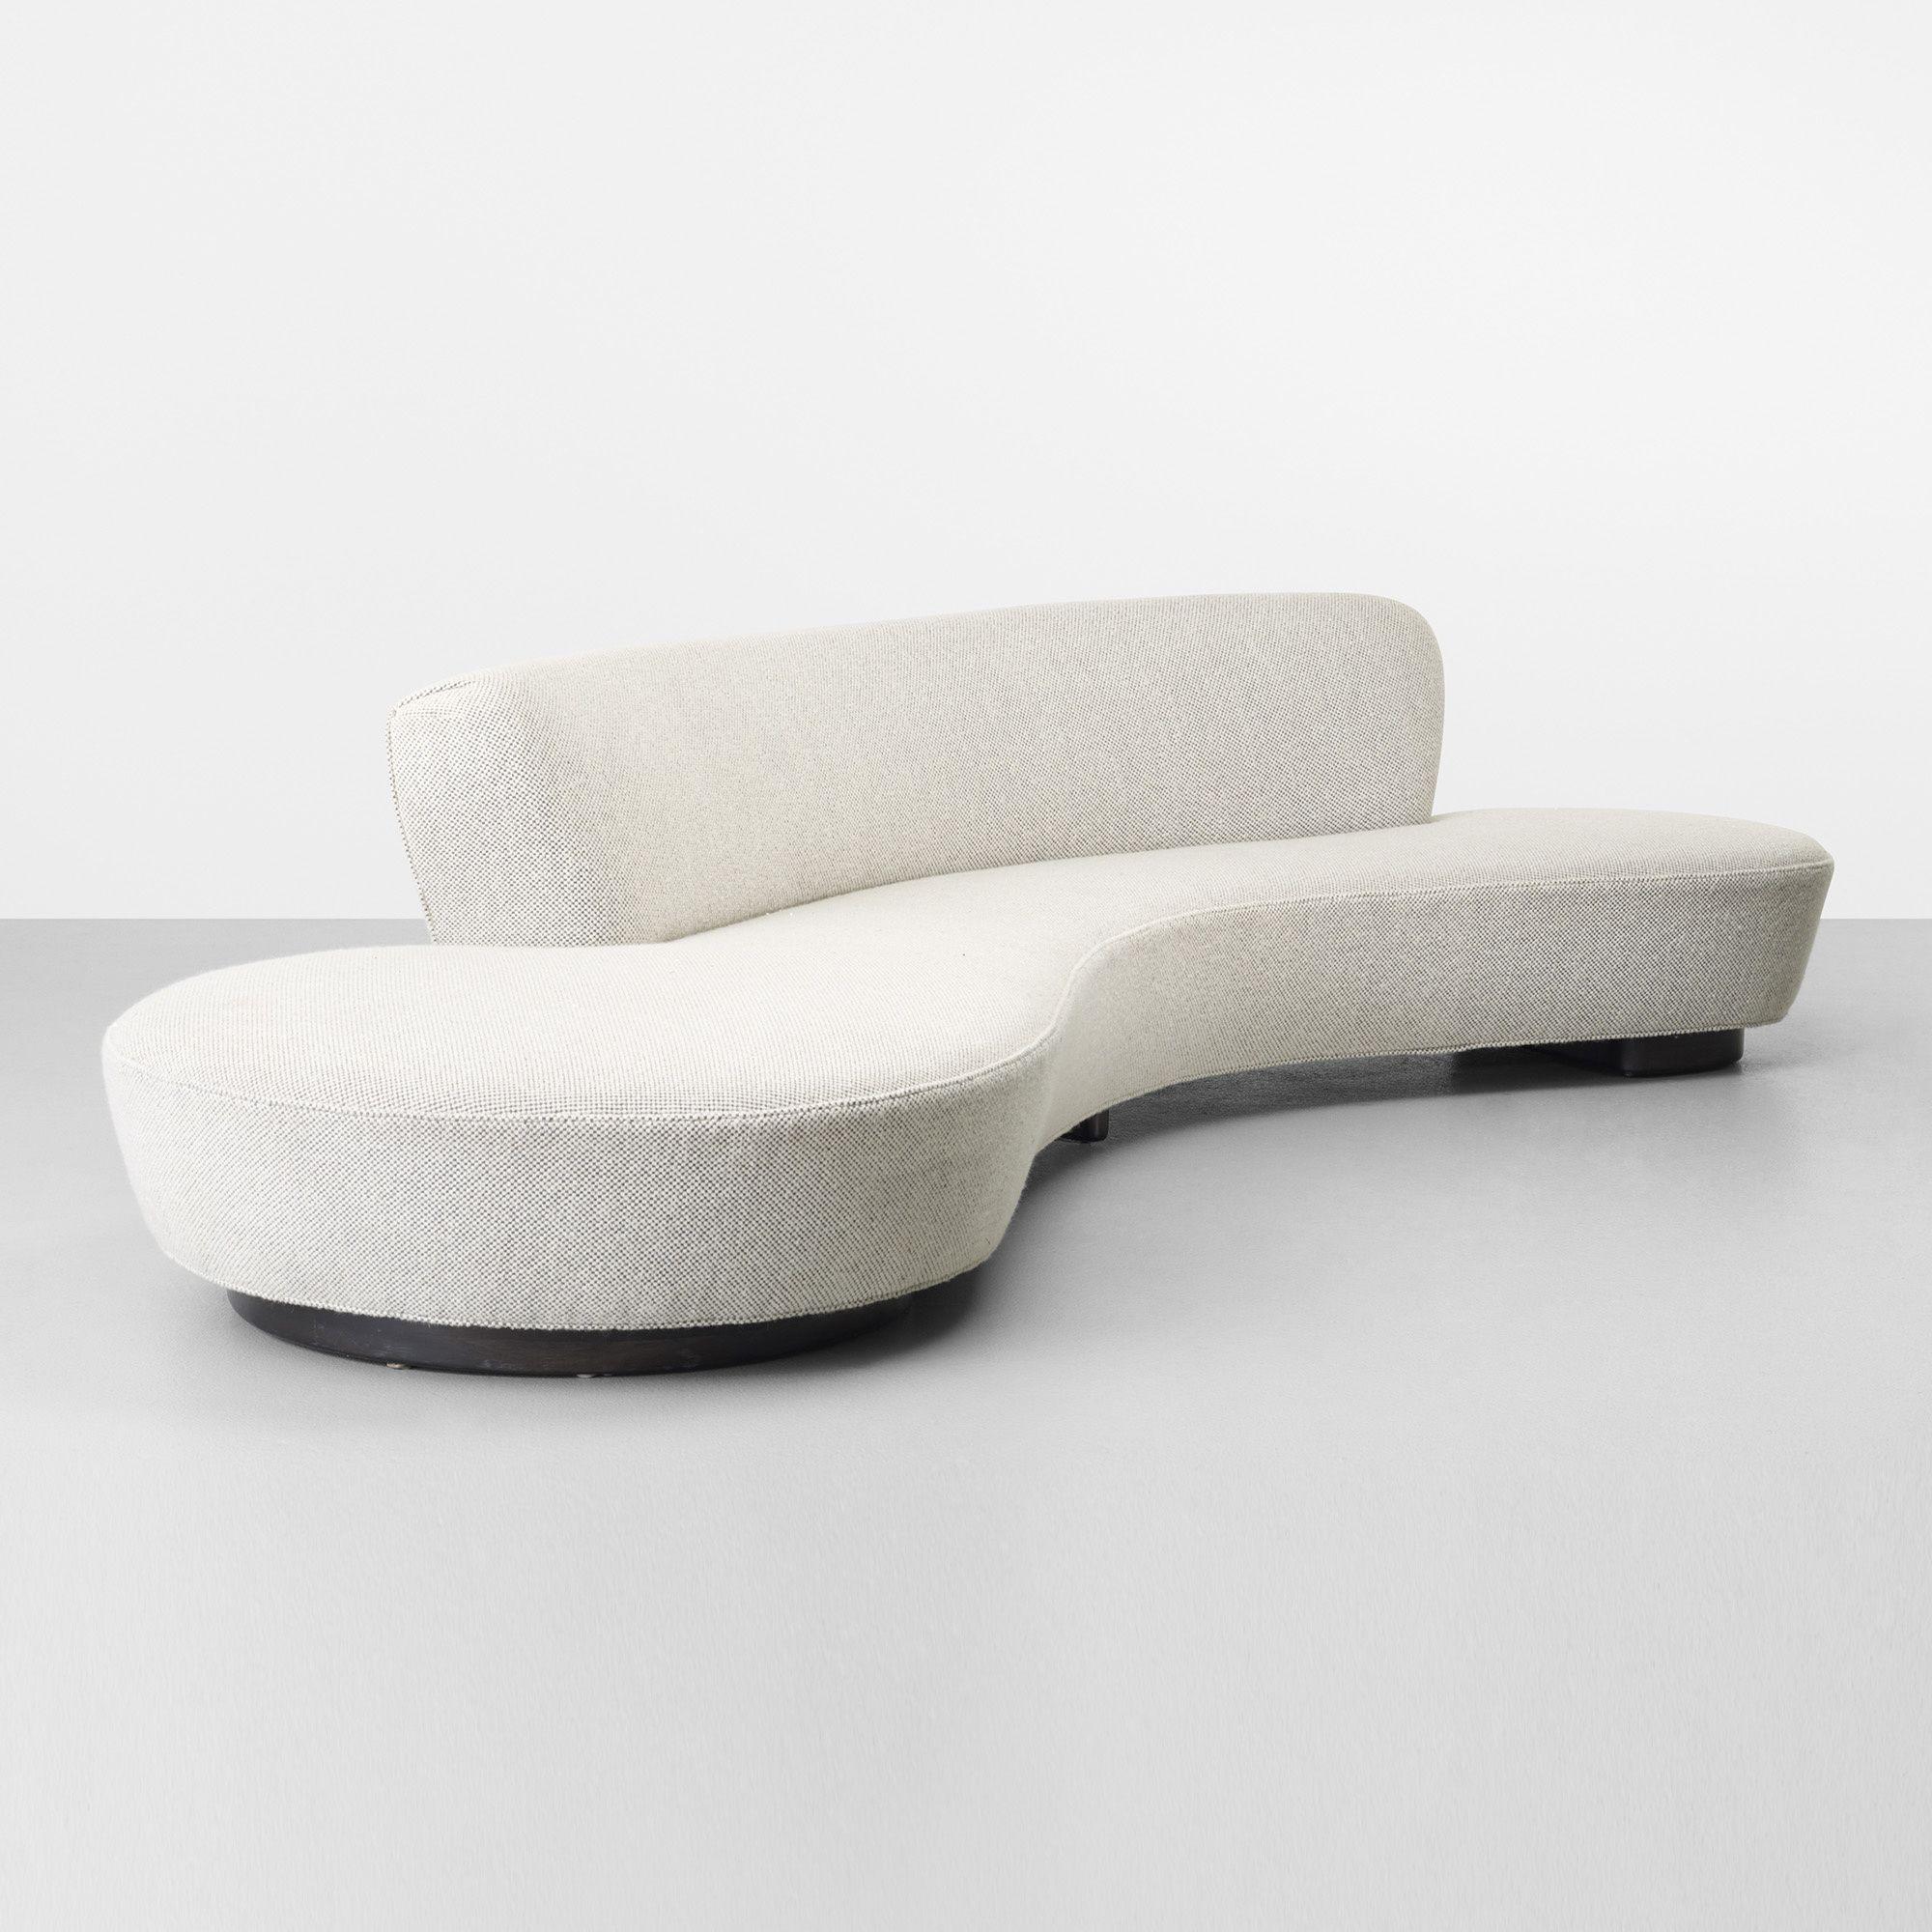 Lot 395 Vladimir Kagan Serpentine Sofa C 1975 Upholstery Lacquered Wood 139 W 64 D 29 H In Result 27 500 Estimate Nel 2020 Divani Poltrone Arredamento